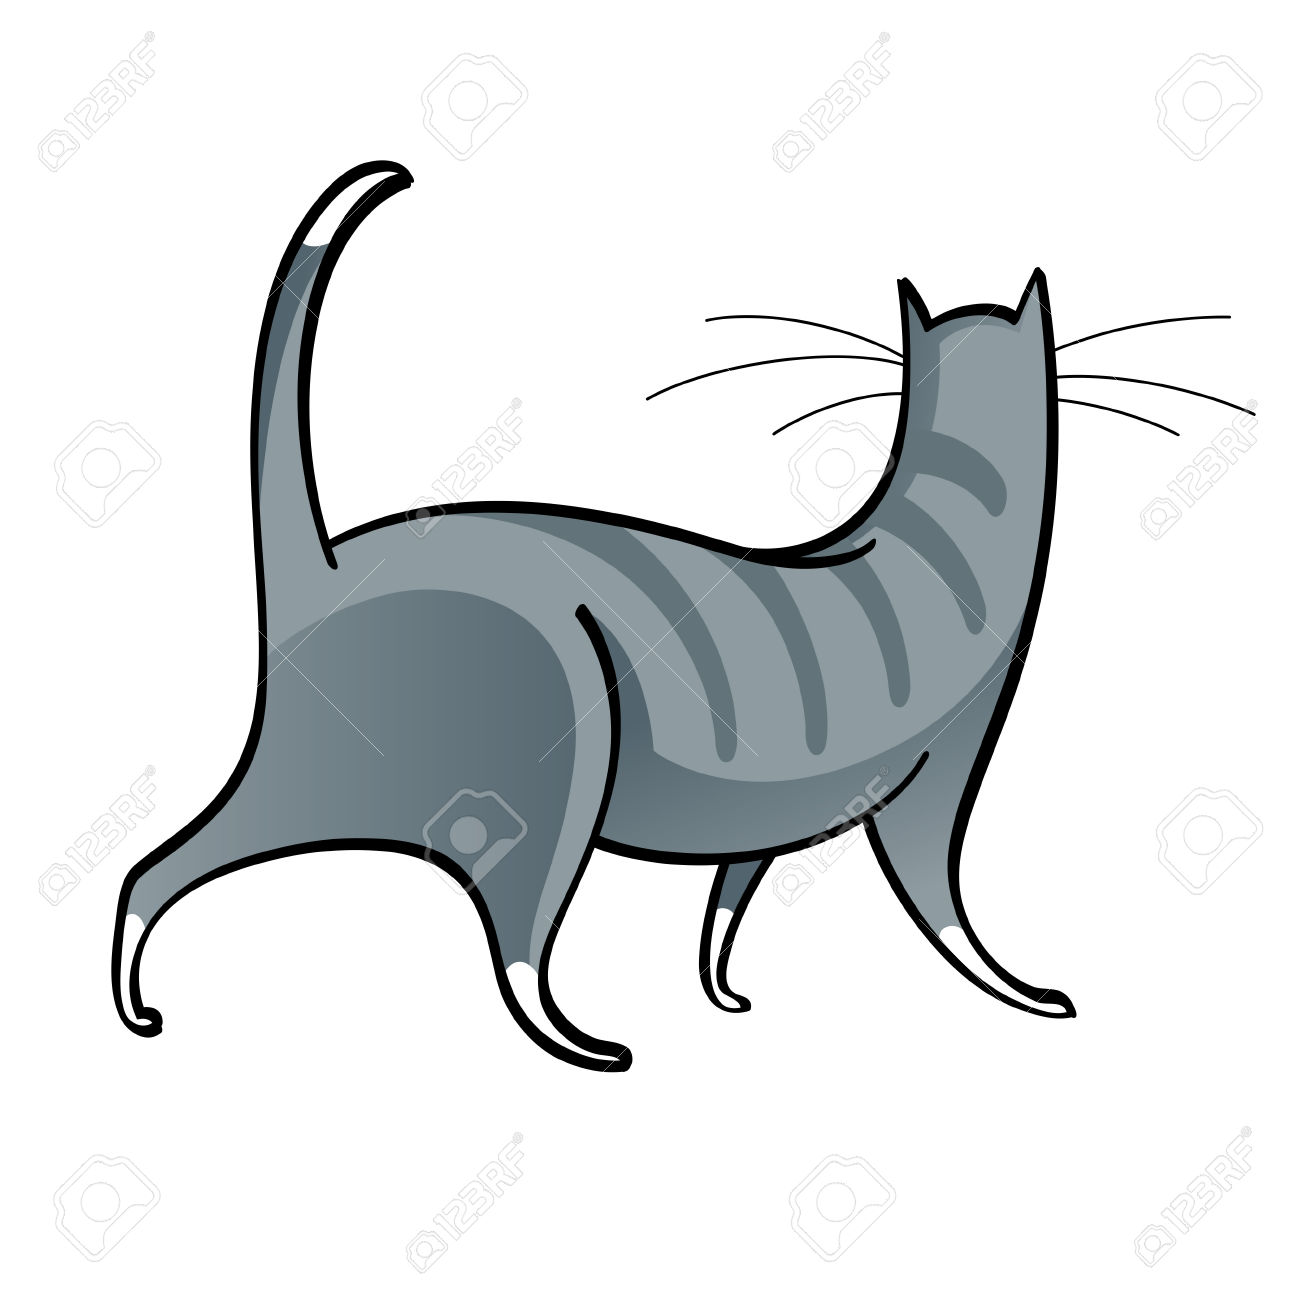 Walking Striped Grey Domestic Cat Animal Feline Royalty Free.